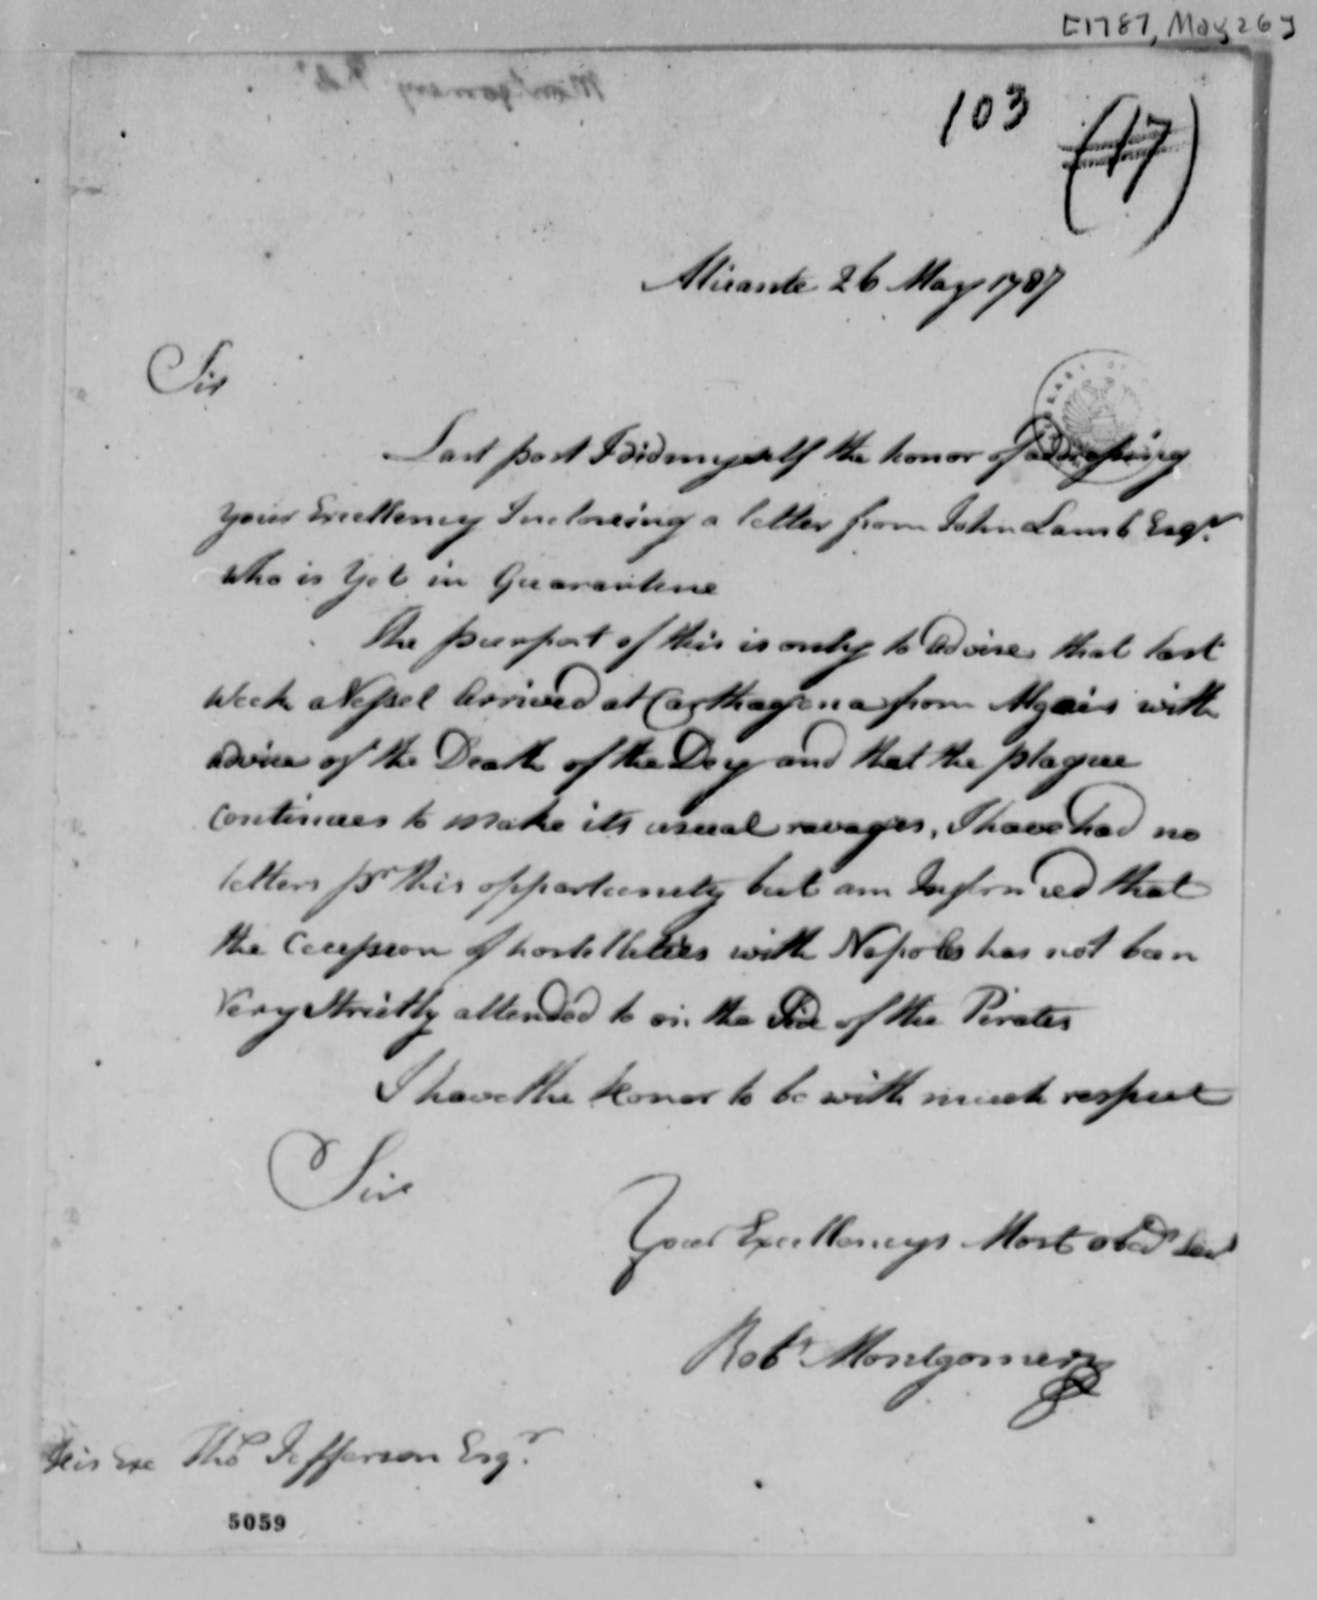 Robert Montgomery to Thomas Jefferson, May 26, 1787